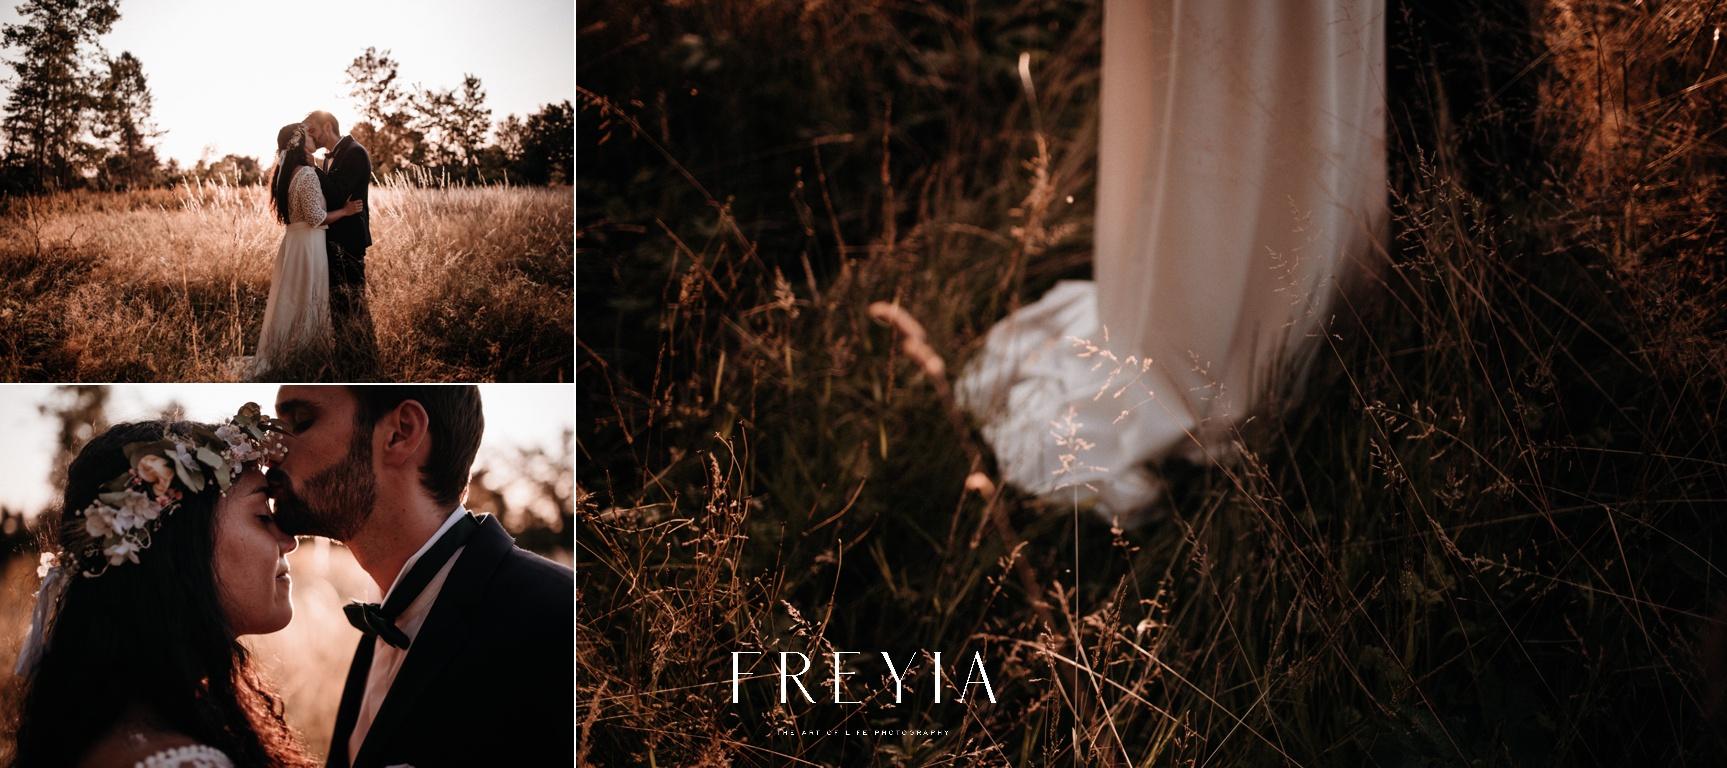 R + T |  mariage reportage alternatif moody intime minimaliste vintage naturel boho boheme |  PHOTOGRAPHE mariage PARIS france destination  | FREYIA photography_-254.jpg